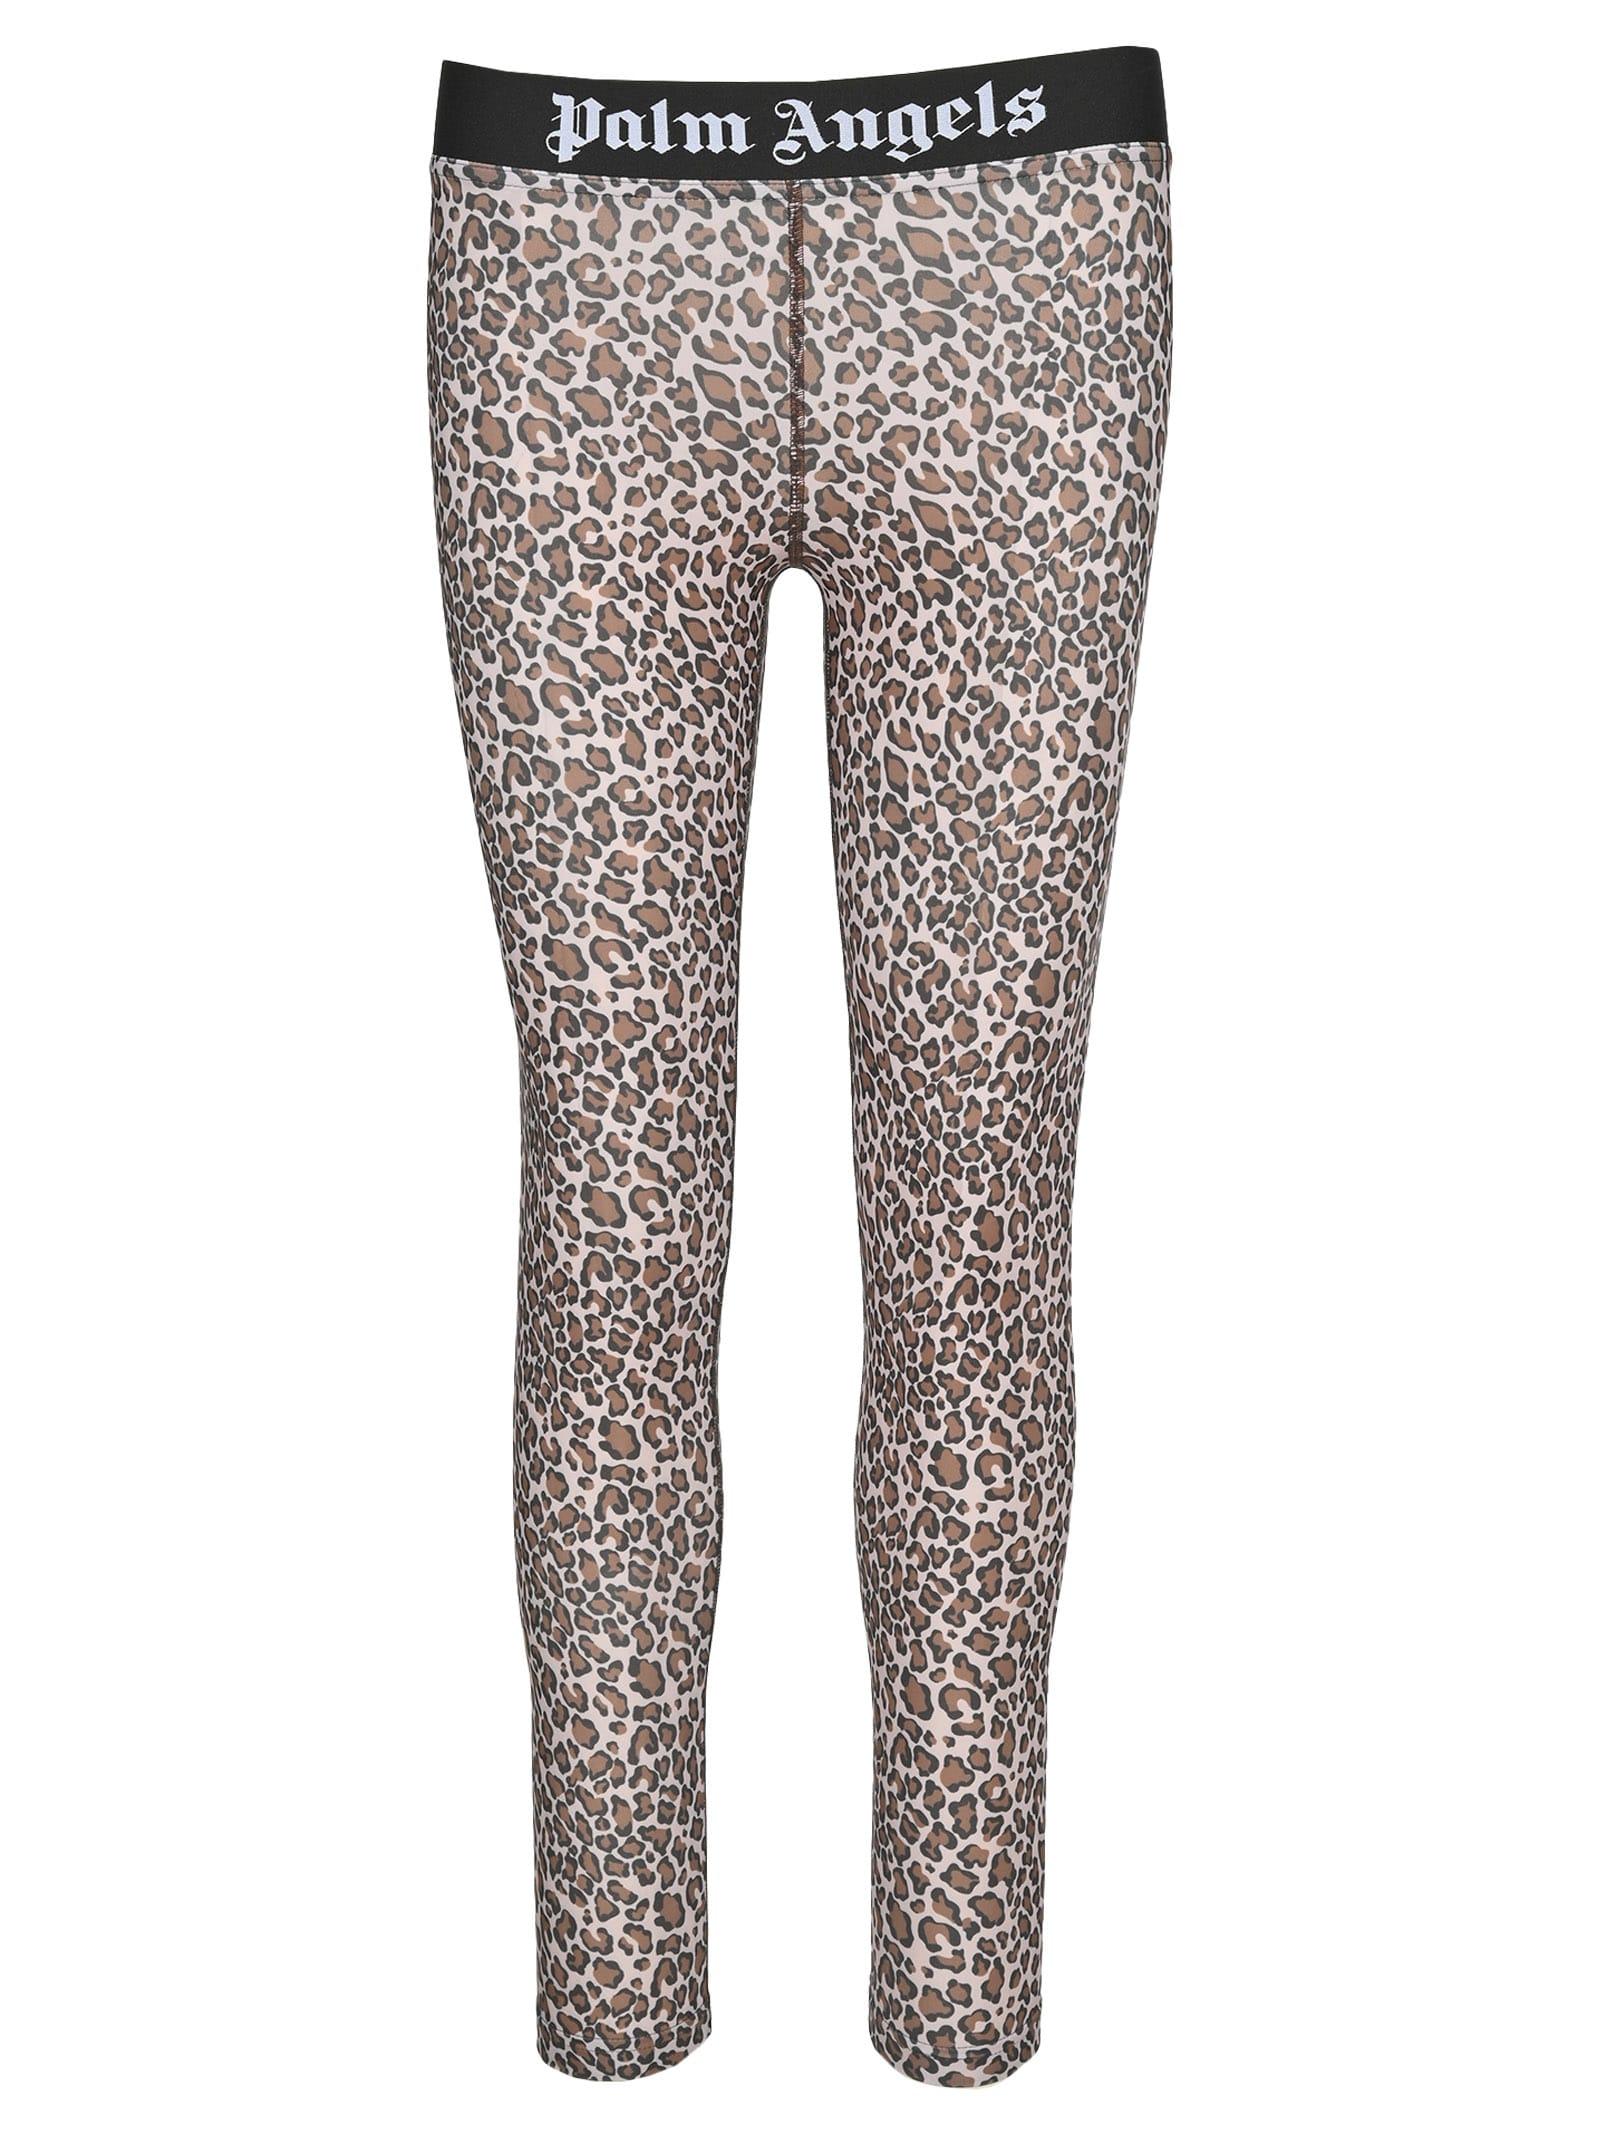 Palm Angels Leopard Leggings